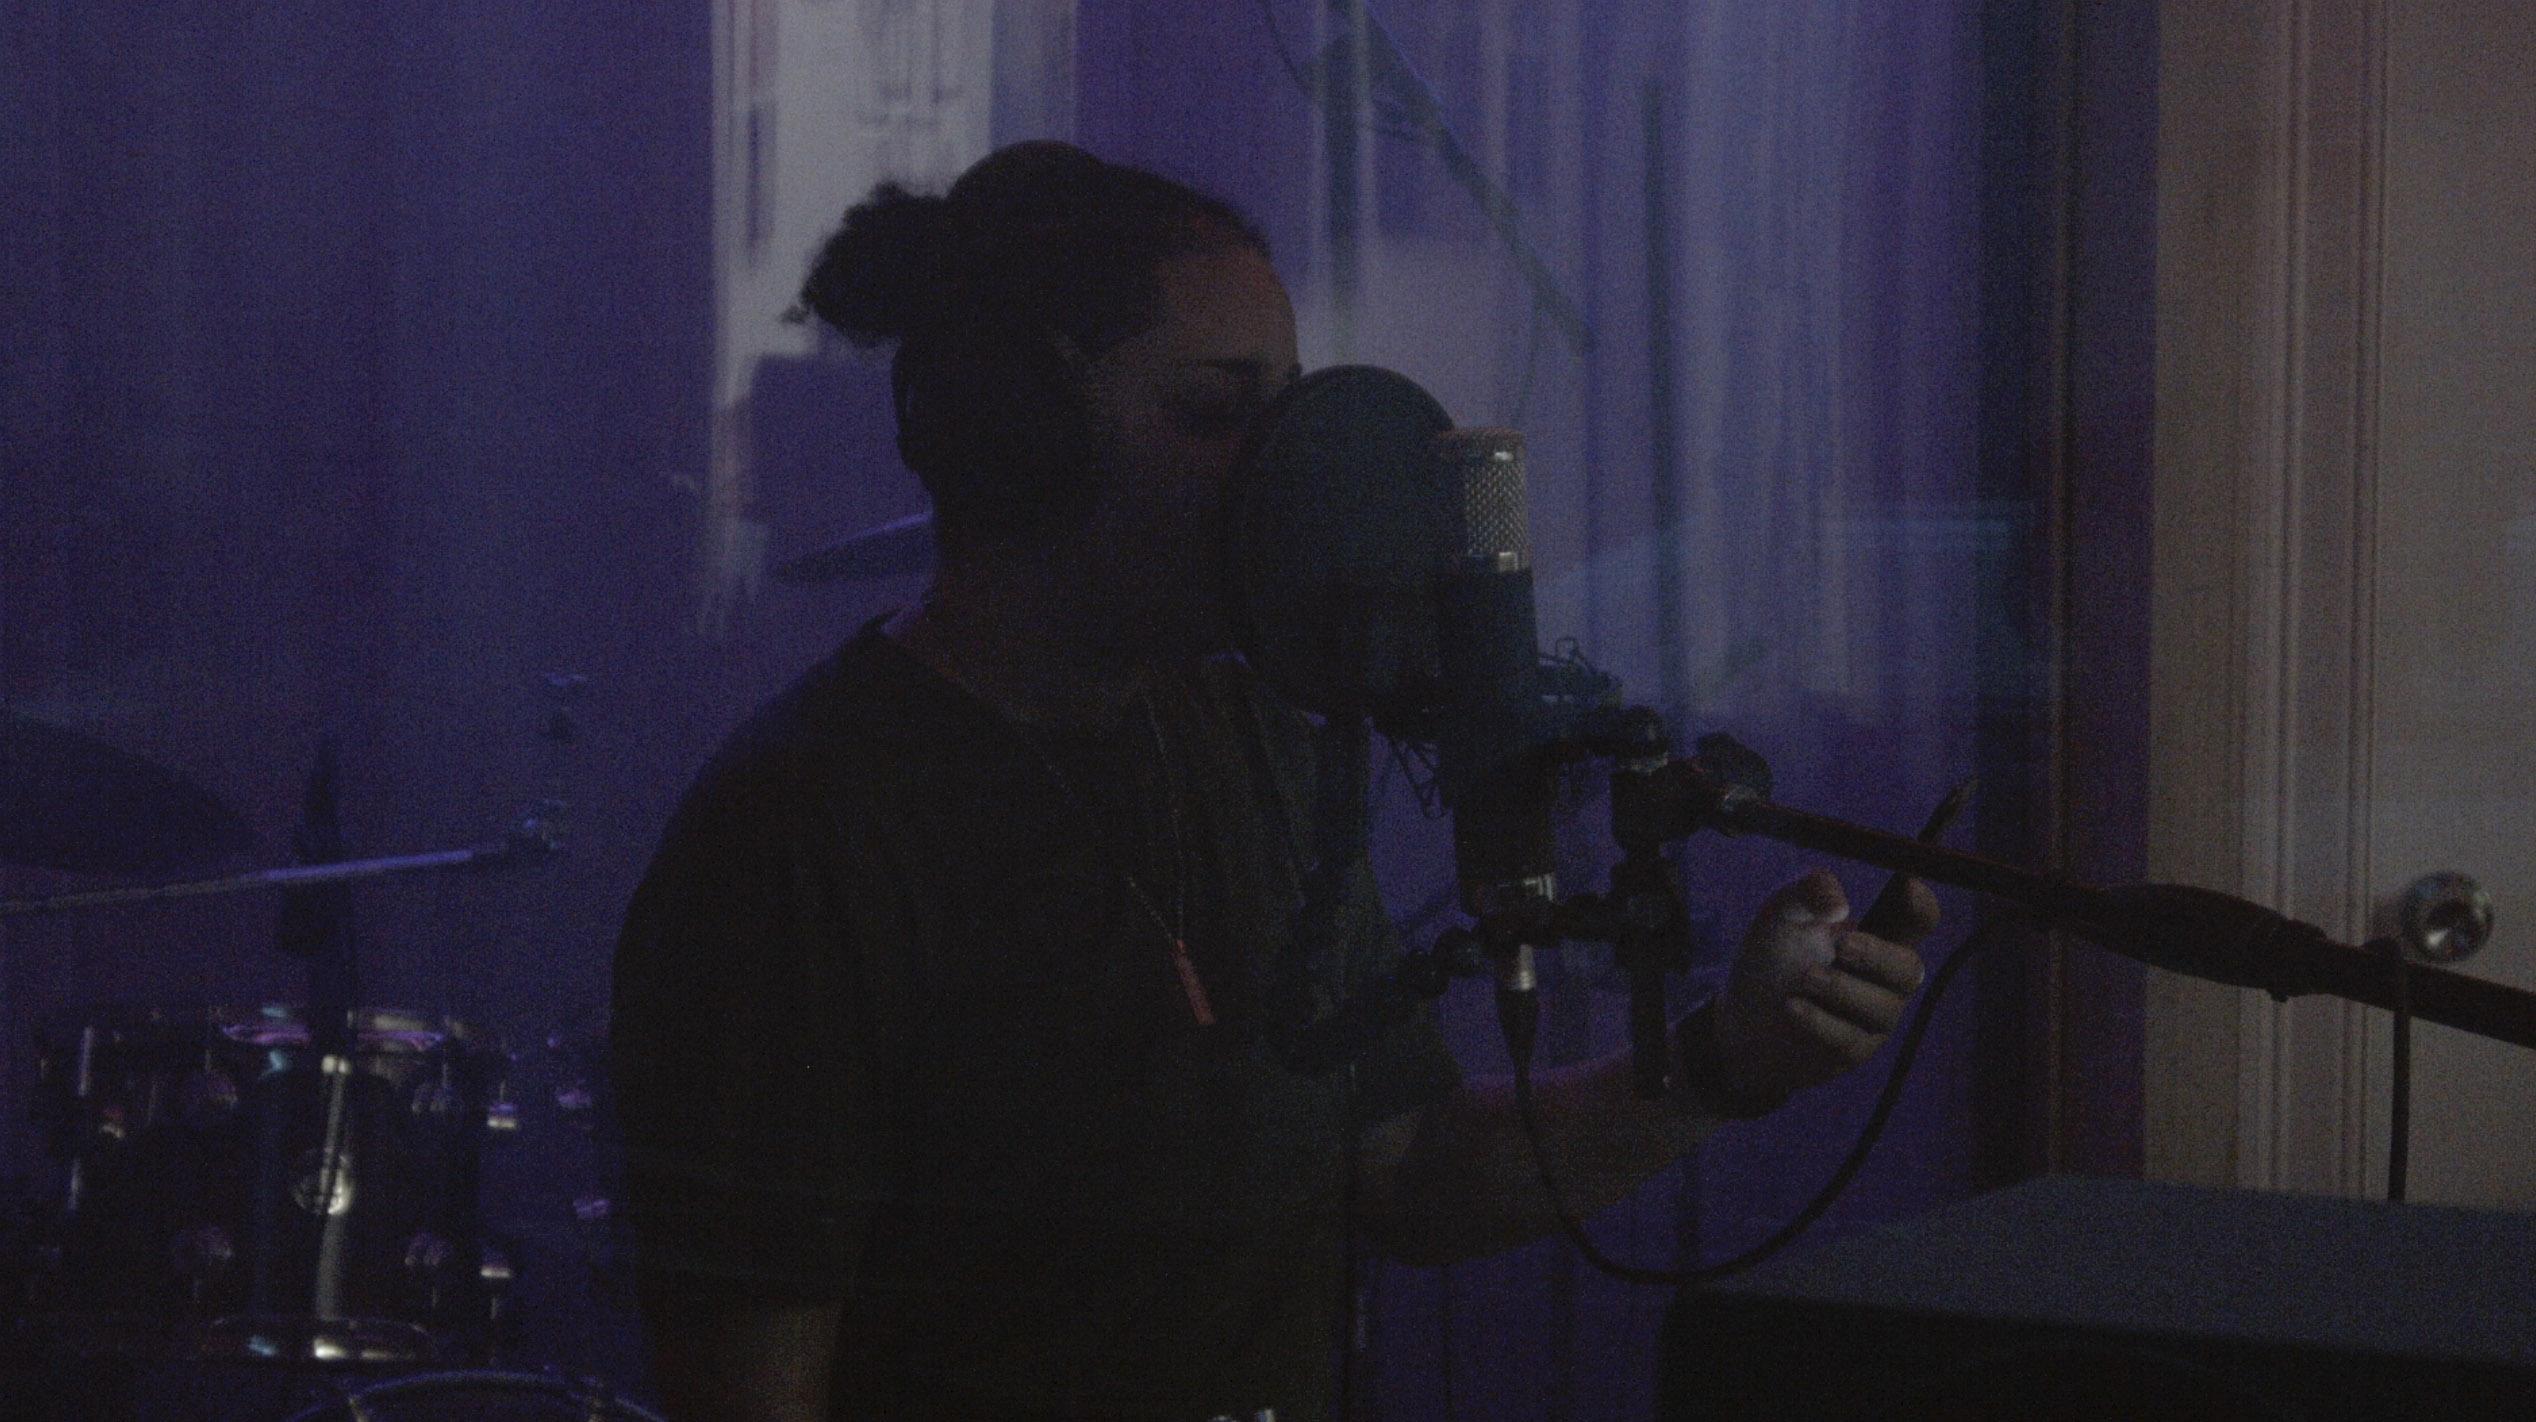 Rae Renegade during a recording session at MJ Studios © Seán Hannan